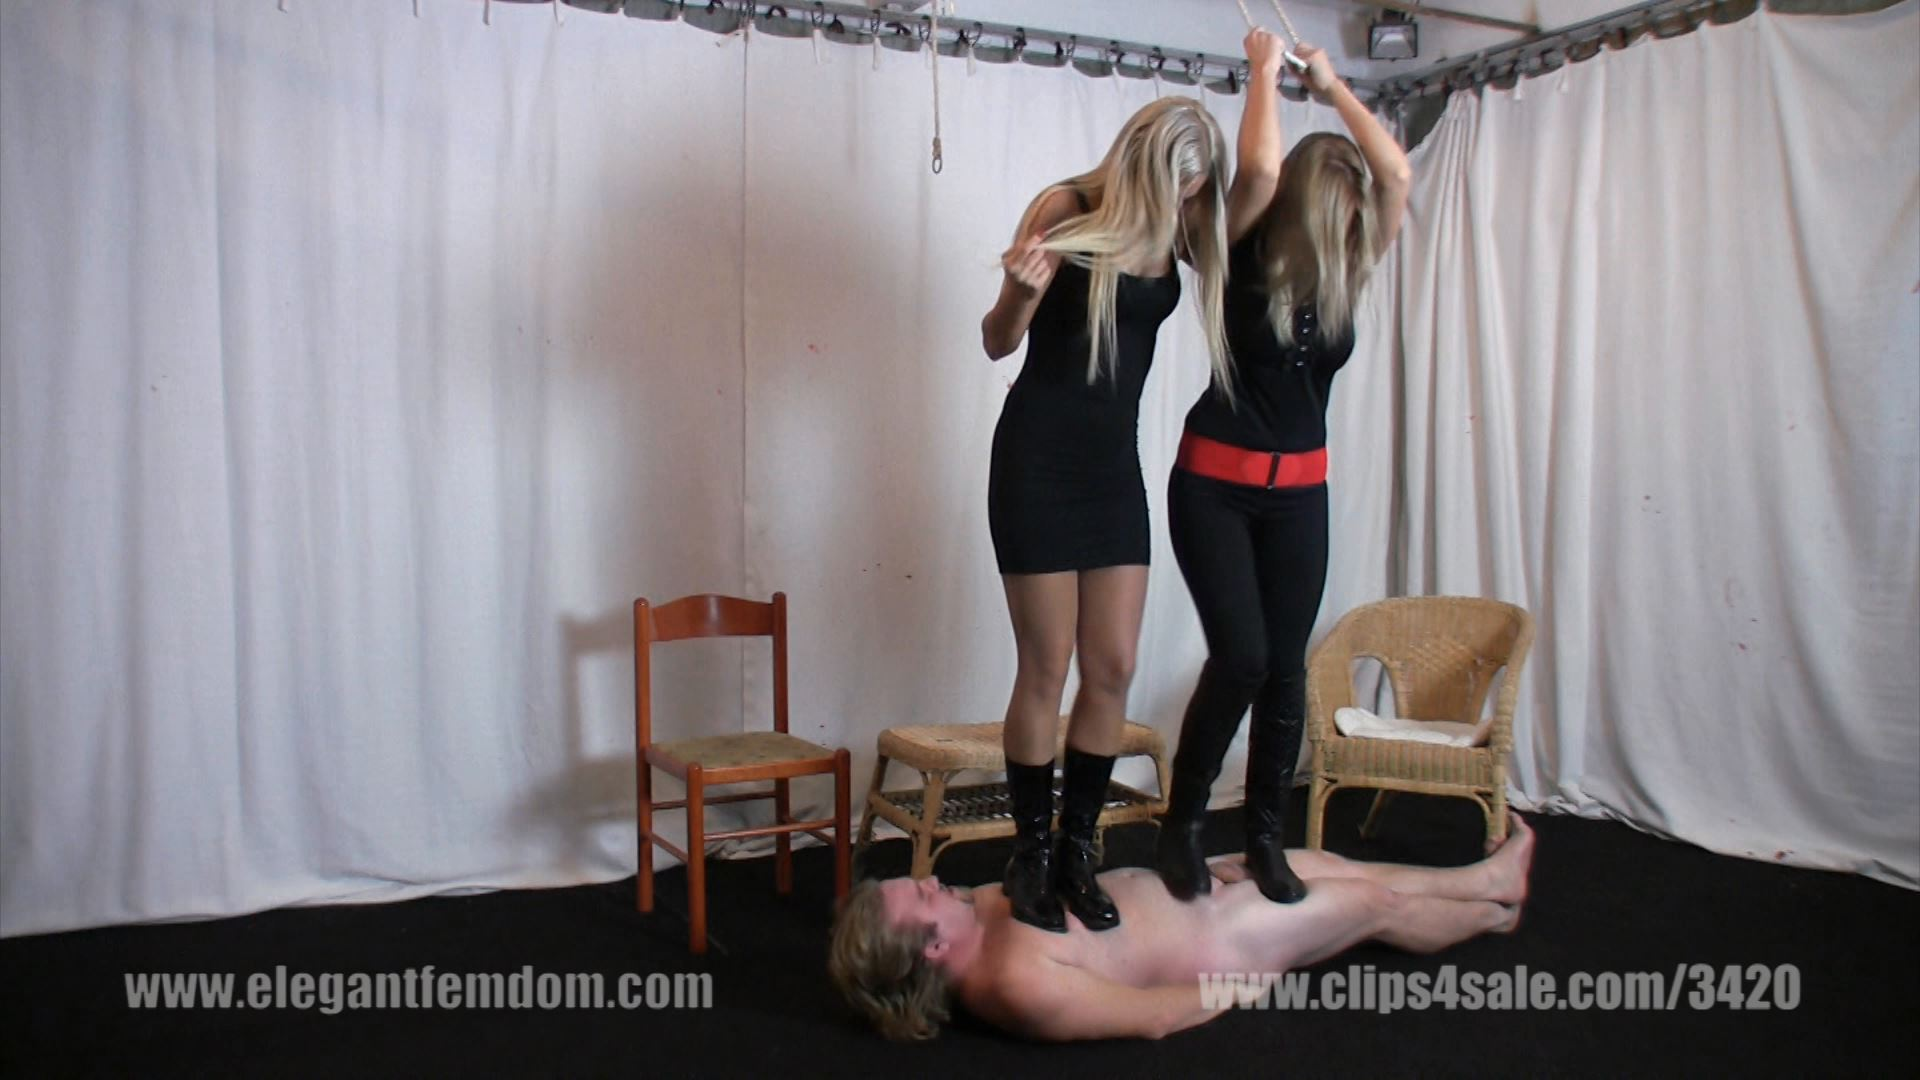 Mistress Demona and Lady Ninette have fun on the carpet slave - ELEGANTFEMDOM - FULL HD/1080p/MP4